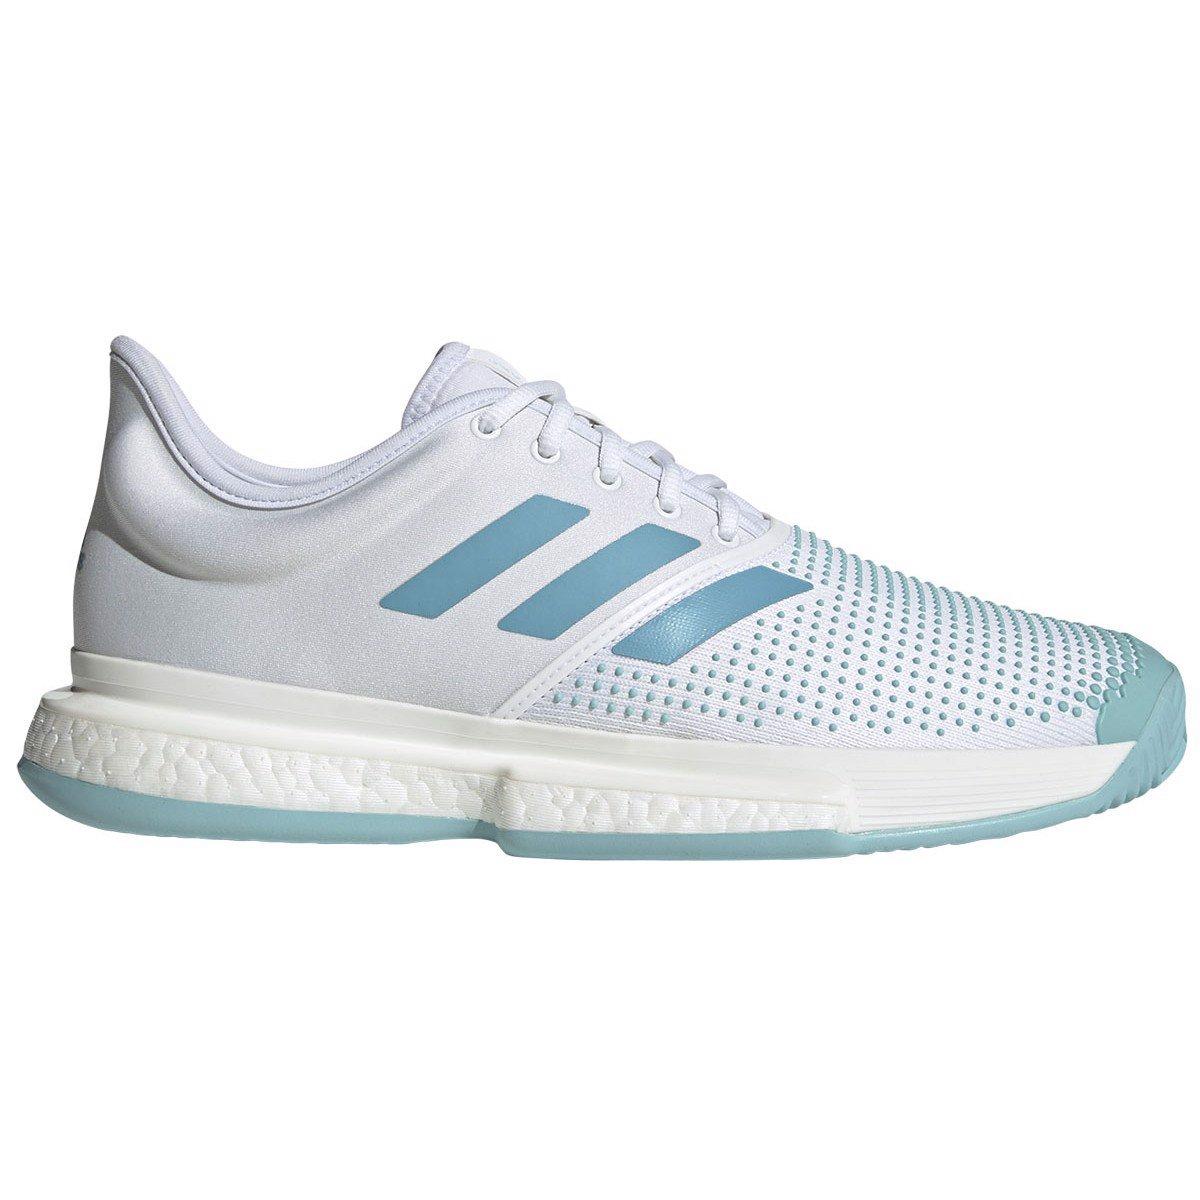 Giày Tennis Adidas (G26295)